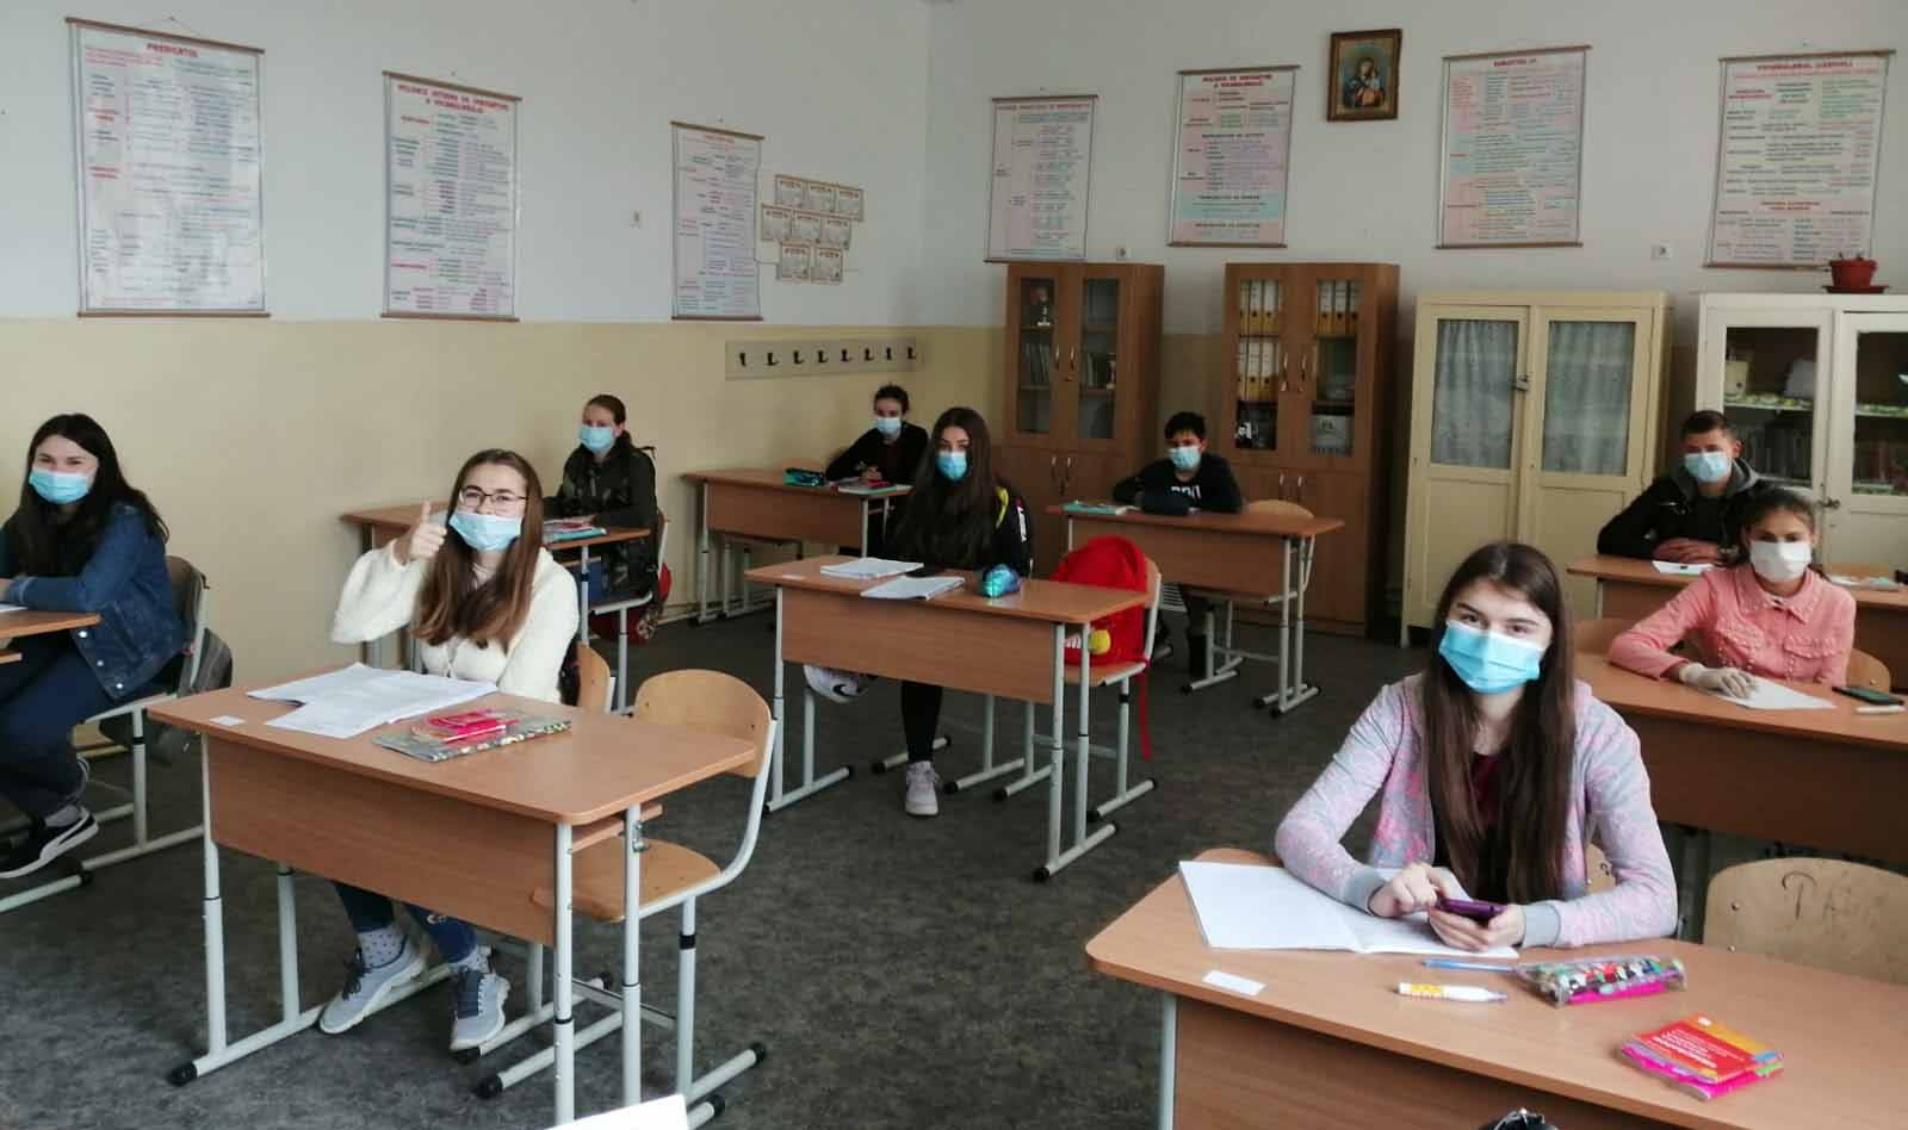 Subiecte Bacalaureat 2020 Matematică. Ce le-a picat elevilor edu.ro